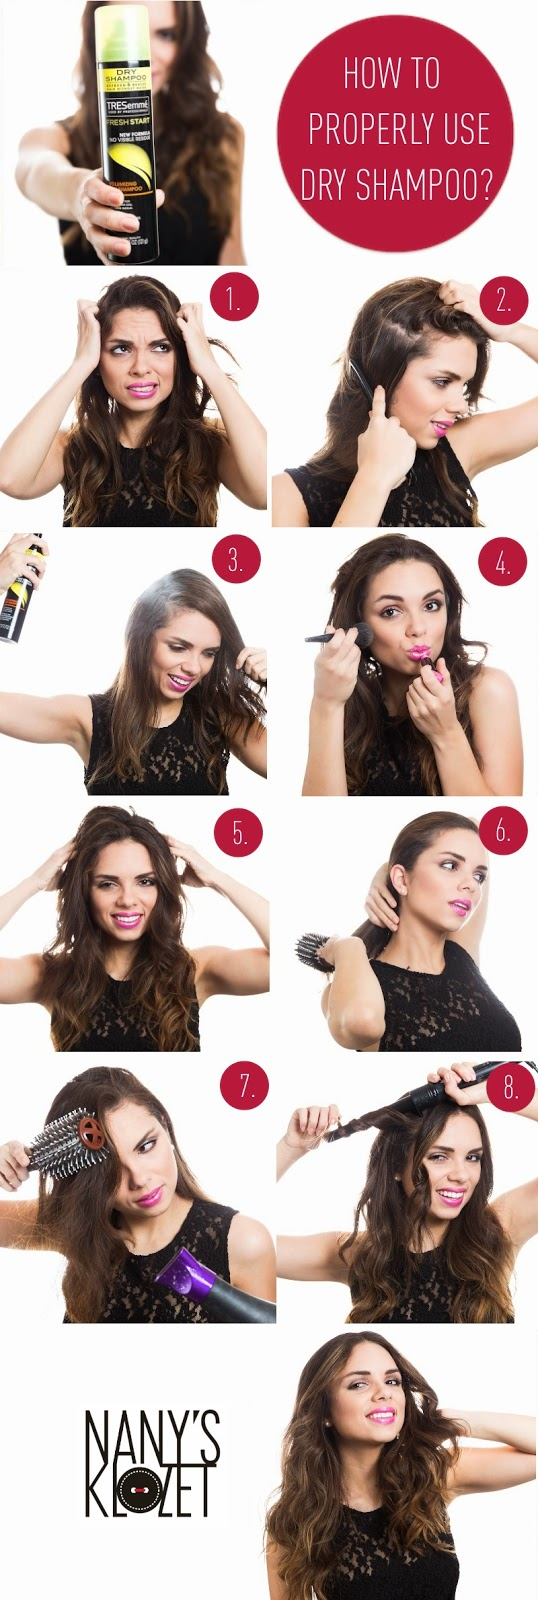 How to Use Dry Shampoo Properly